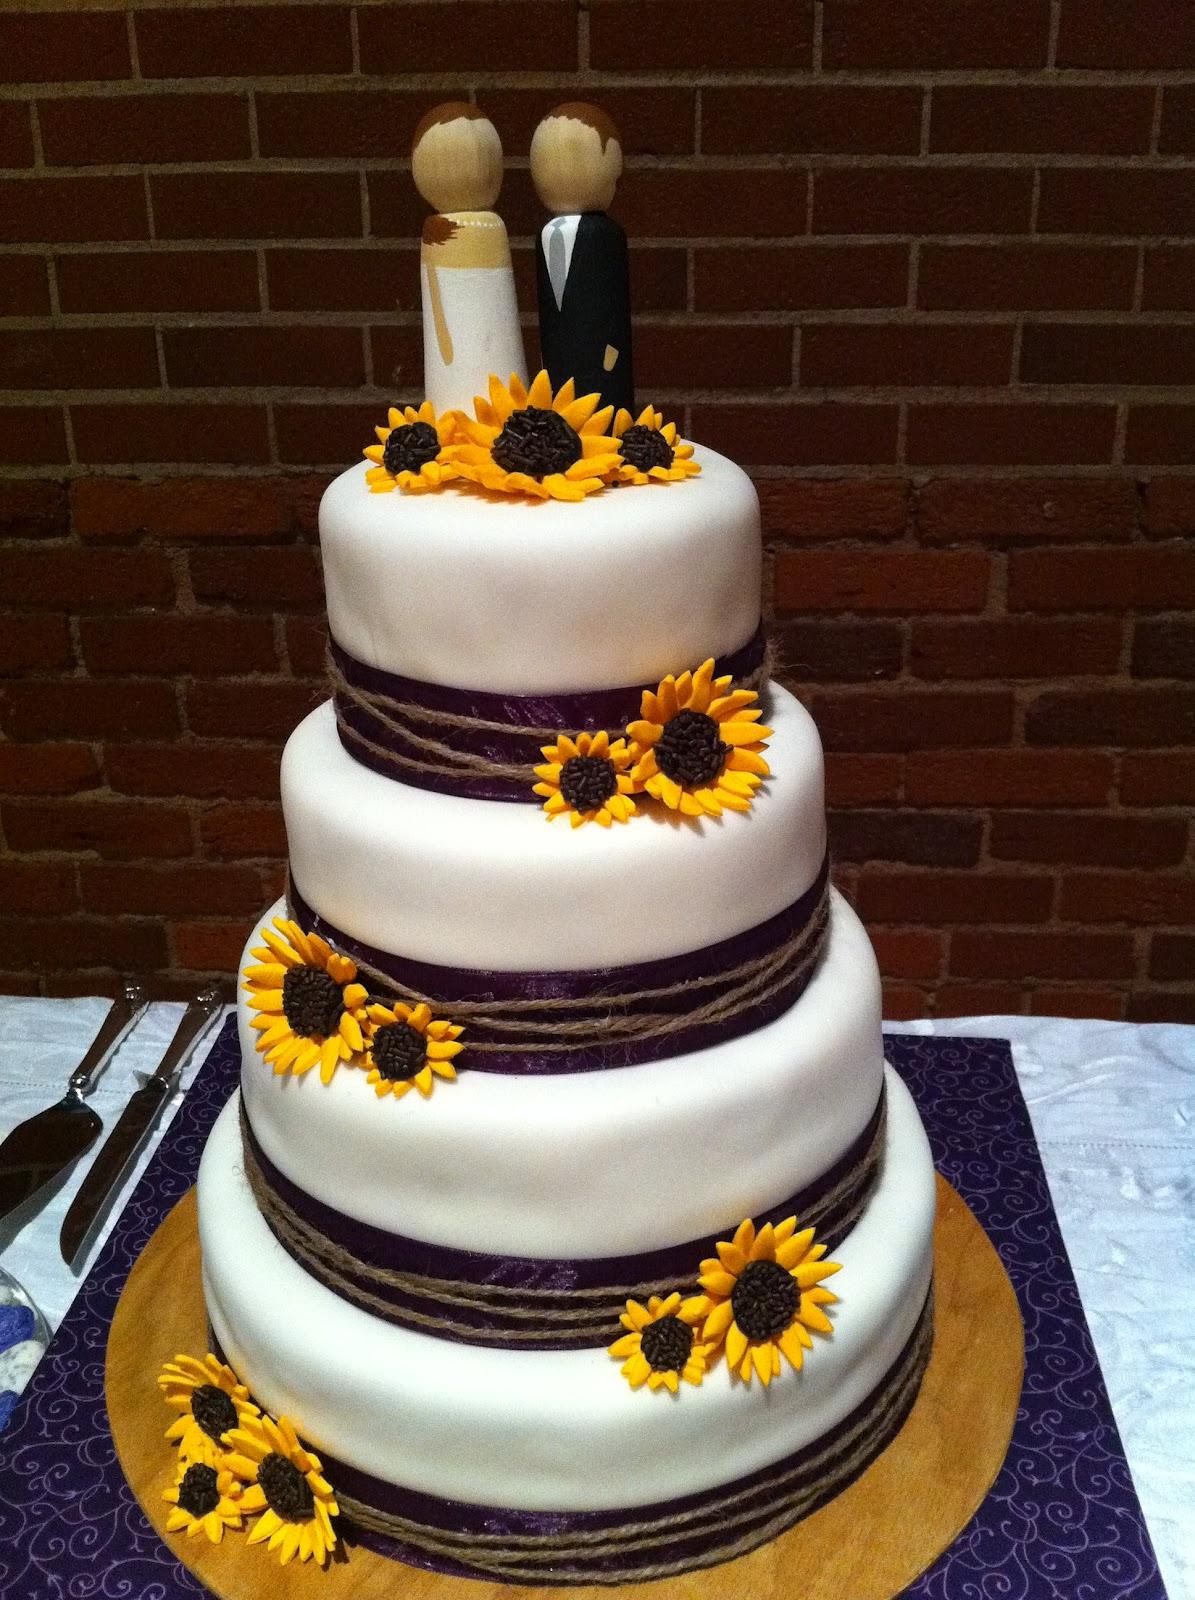 sarah jones cakes wedding cakes. Black Bedroom Furniture Sets. Home Design Ideas